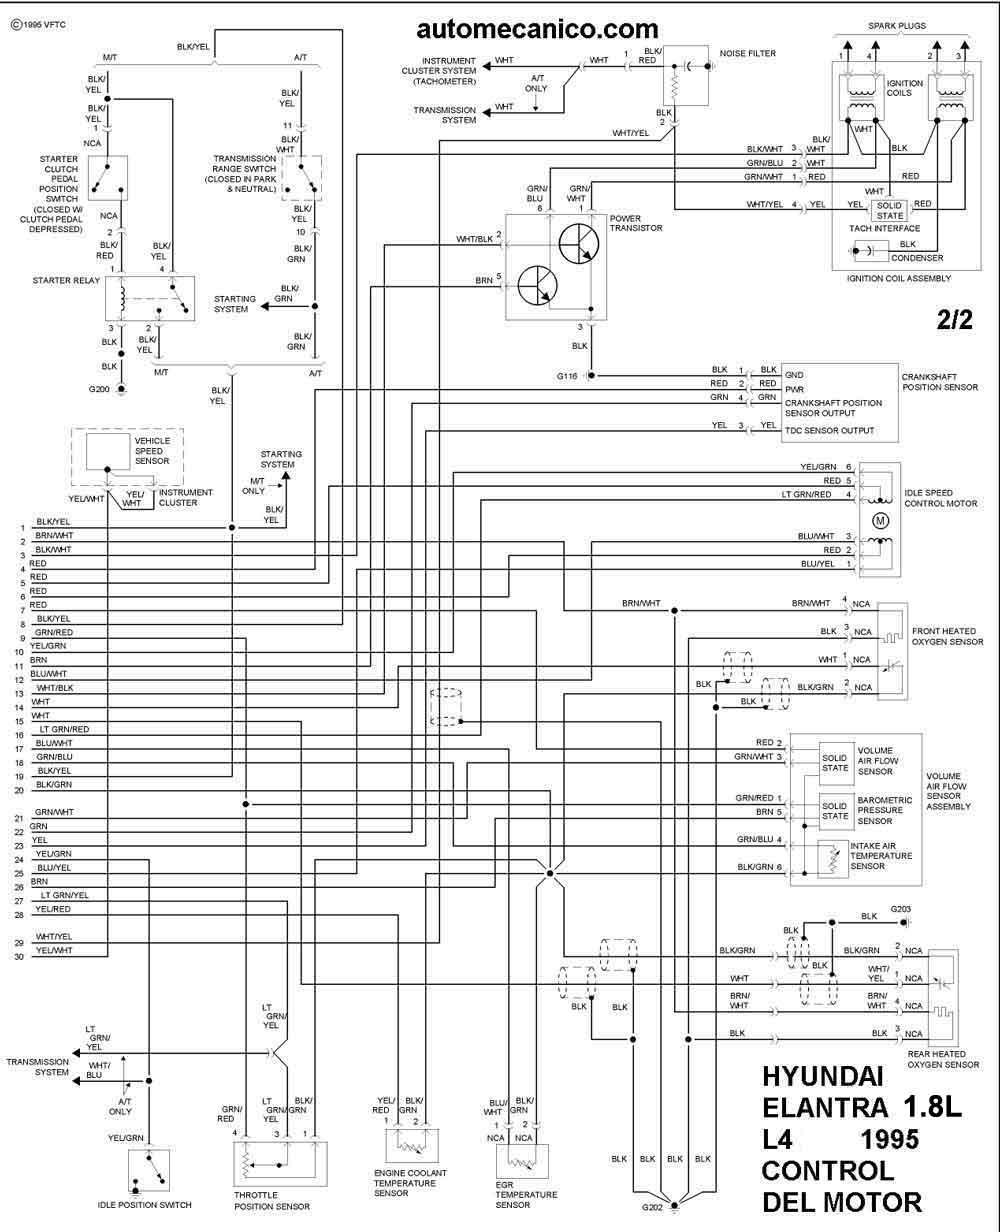 95 hyundai excel wiring diagram